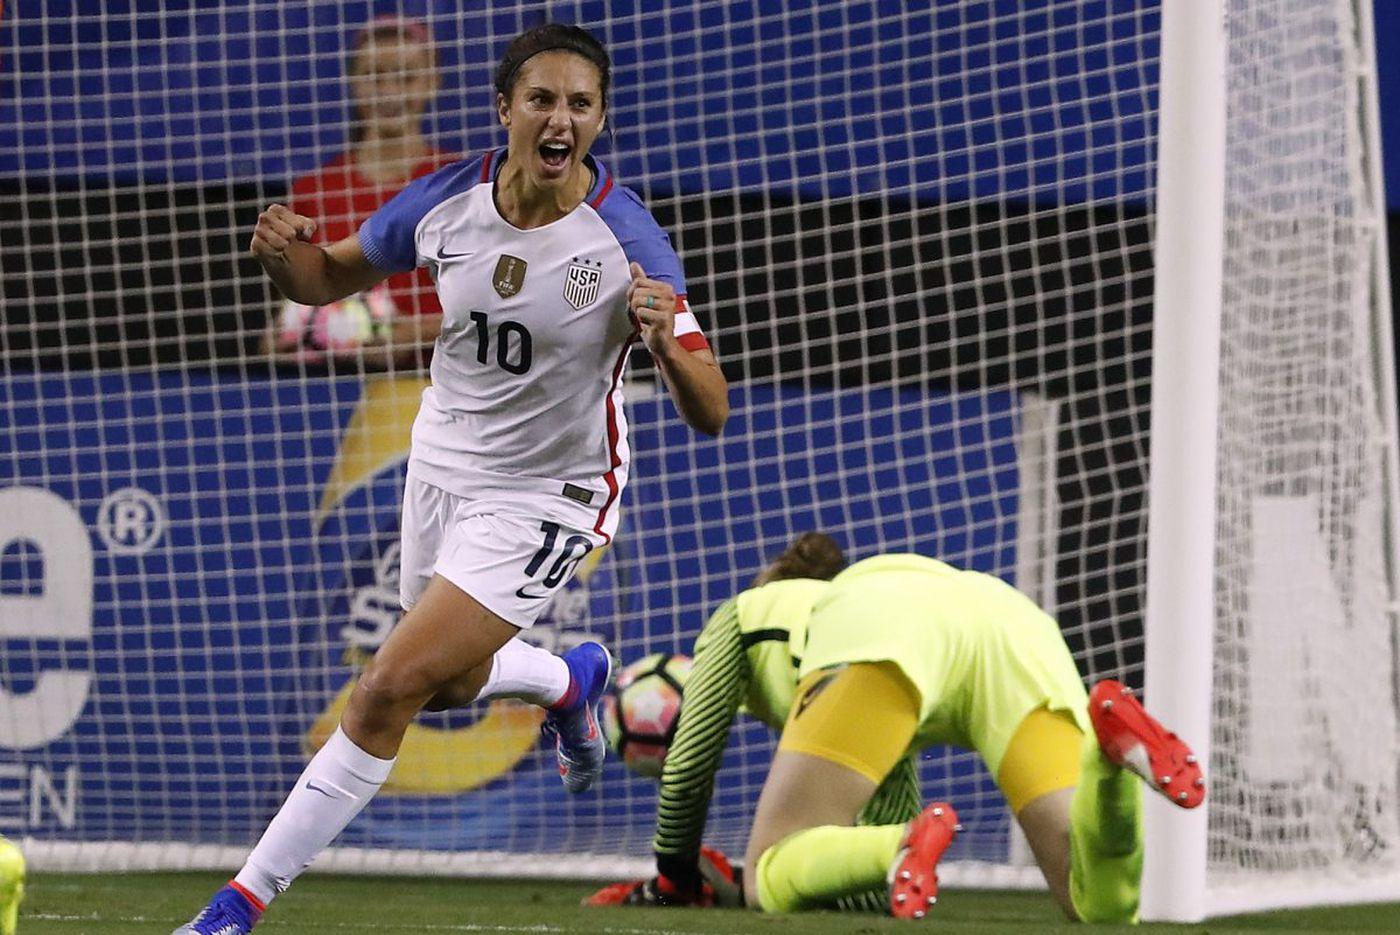 Carli Lloyd aiming at World Cup as she returns to U.S. national team